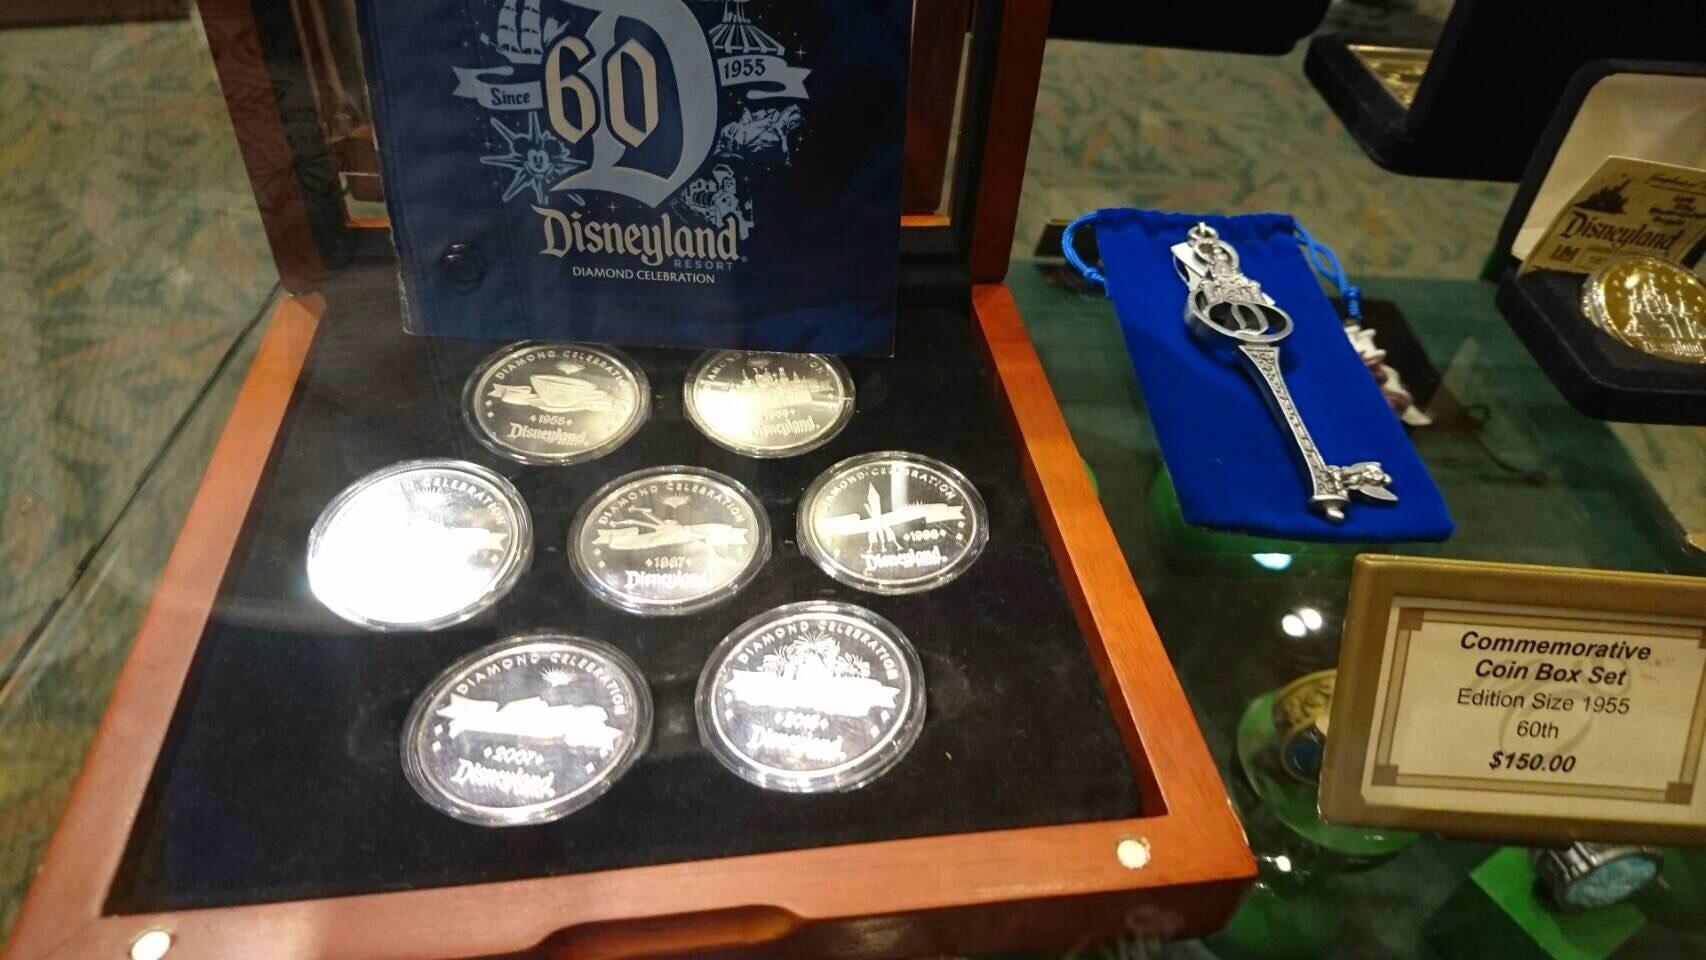 Disneyland ワールドオブディズニー ディズニーギャラリー 60周年コイン 201609